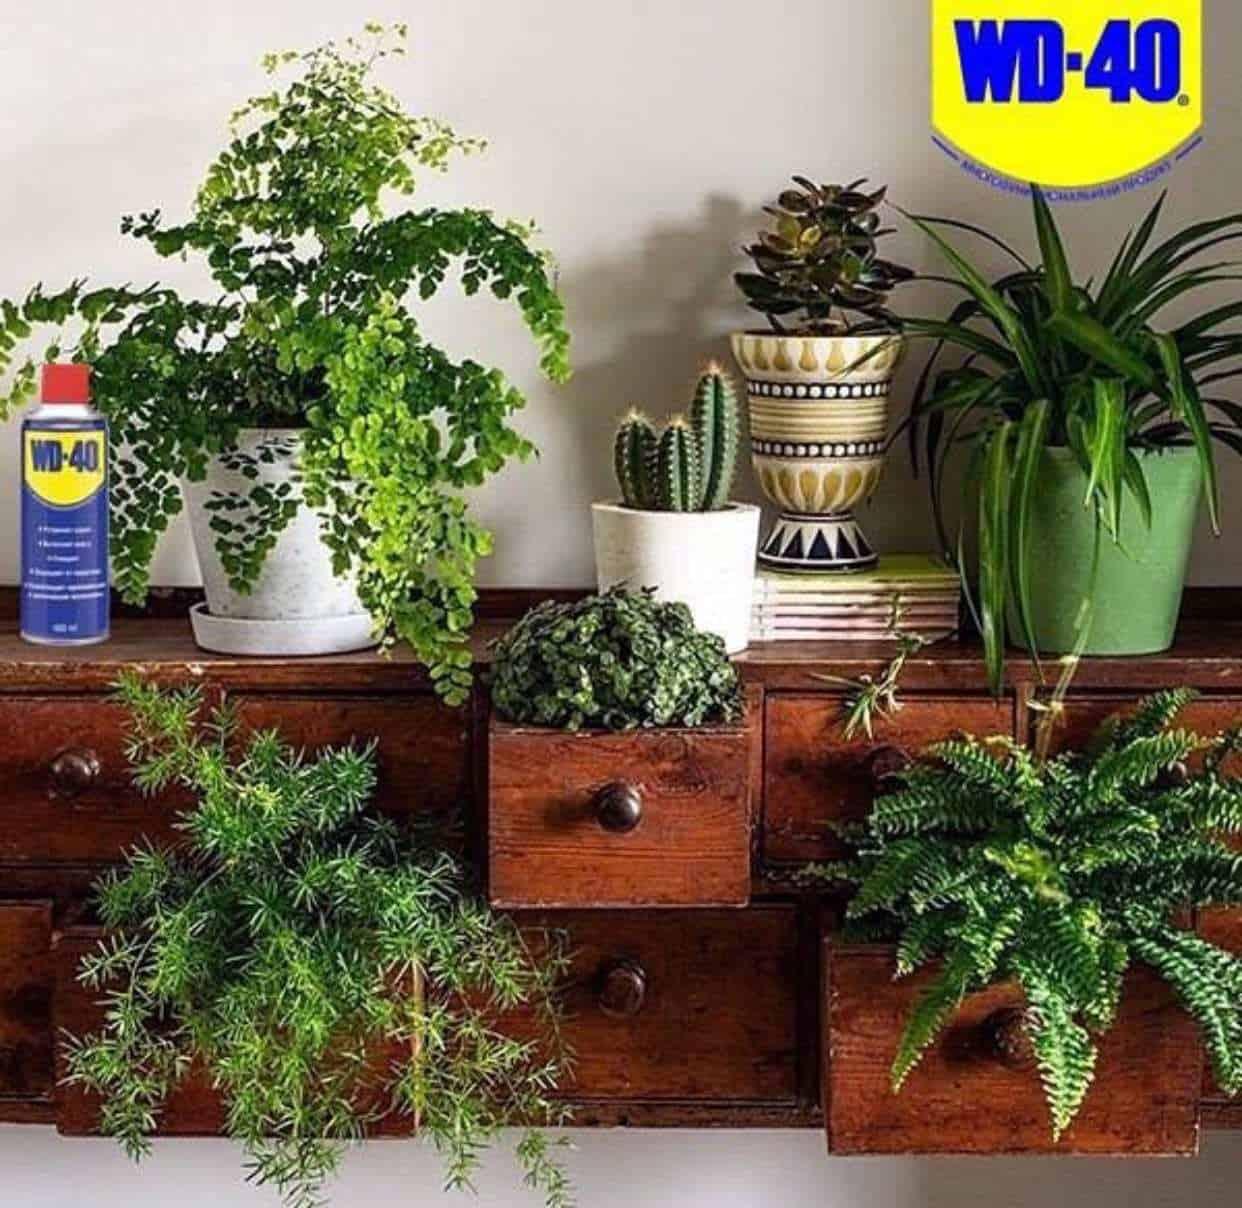 WD-40 защитит ваши горшки и растения